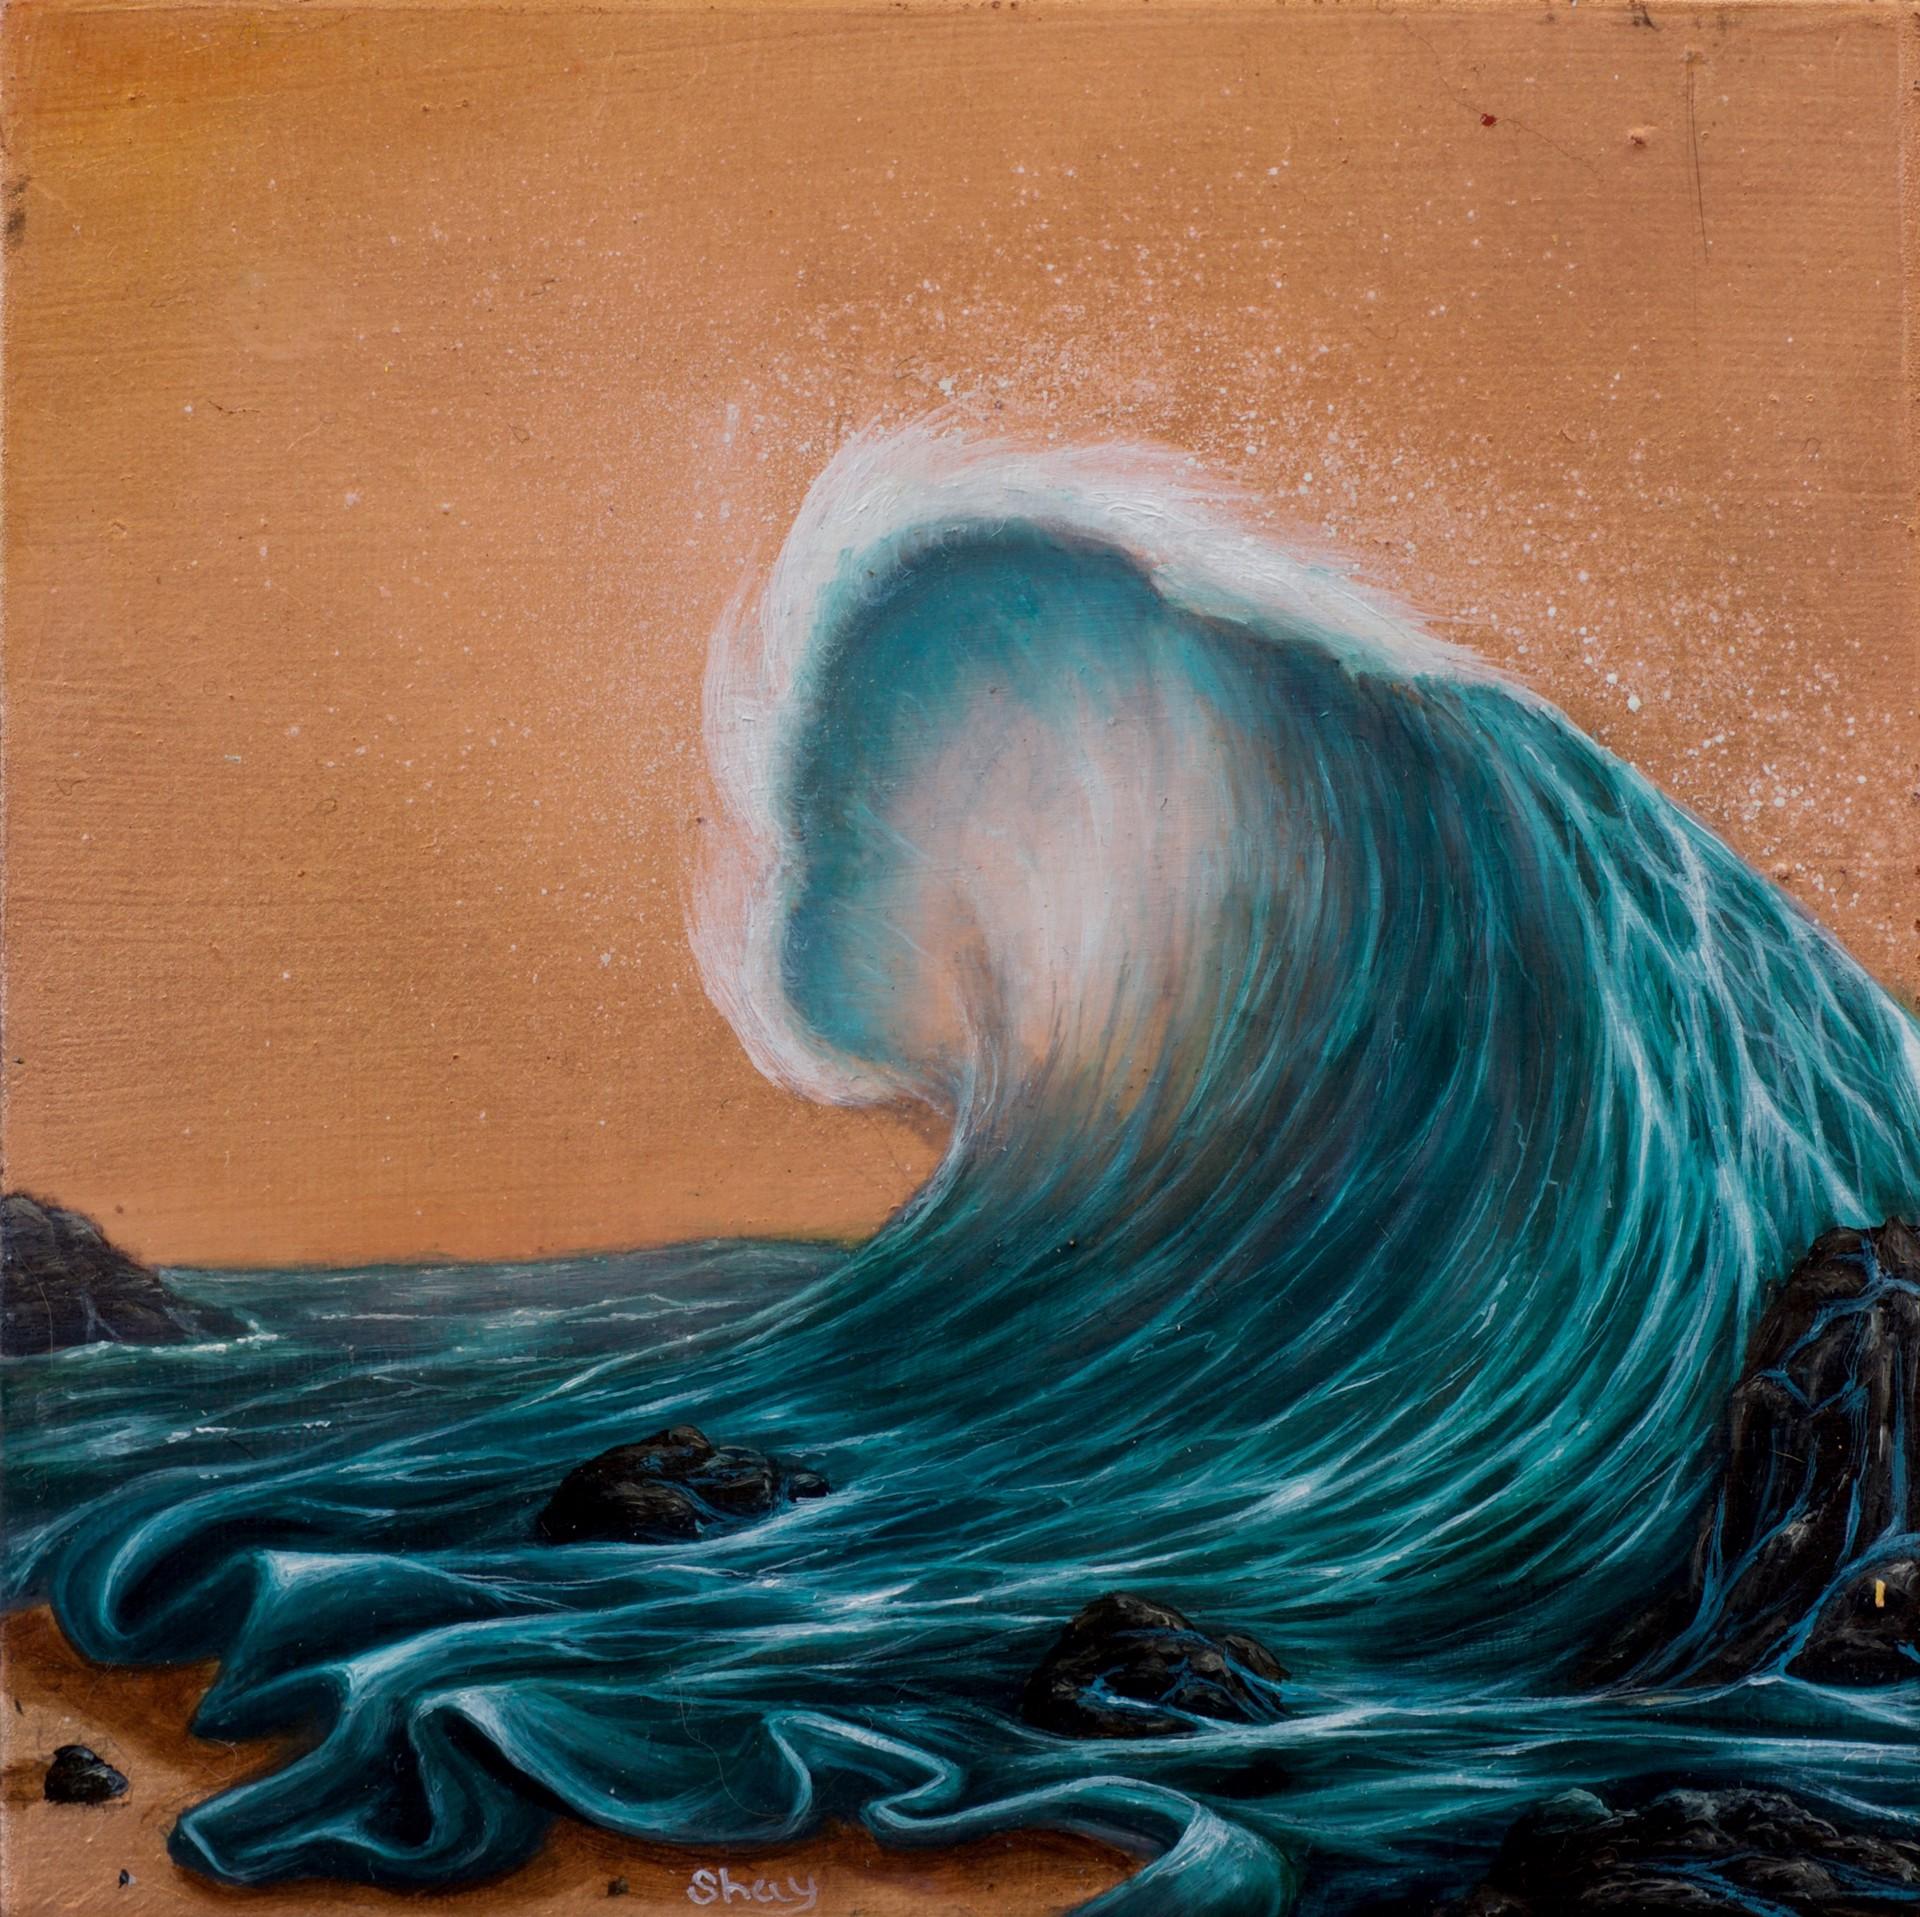 The Warm Wave by Shay Davis